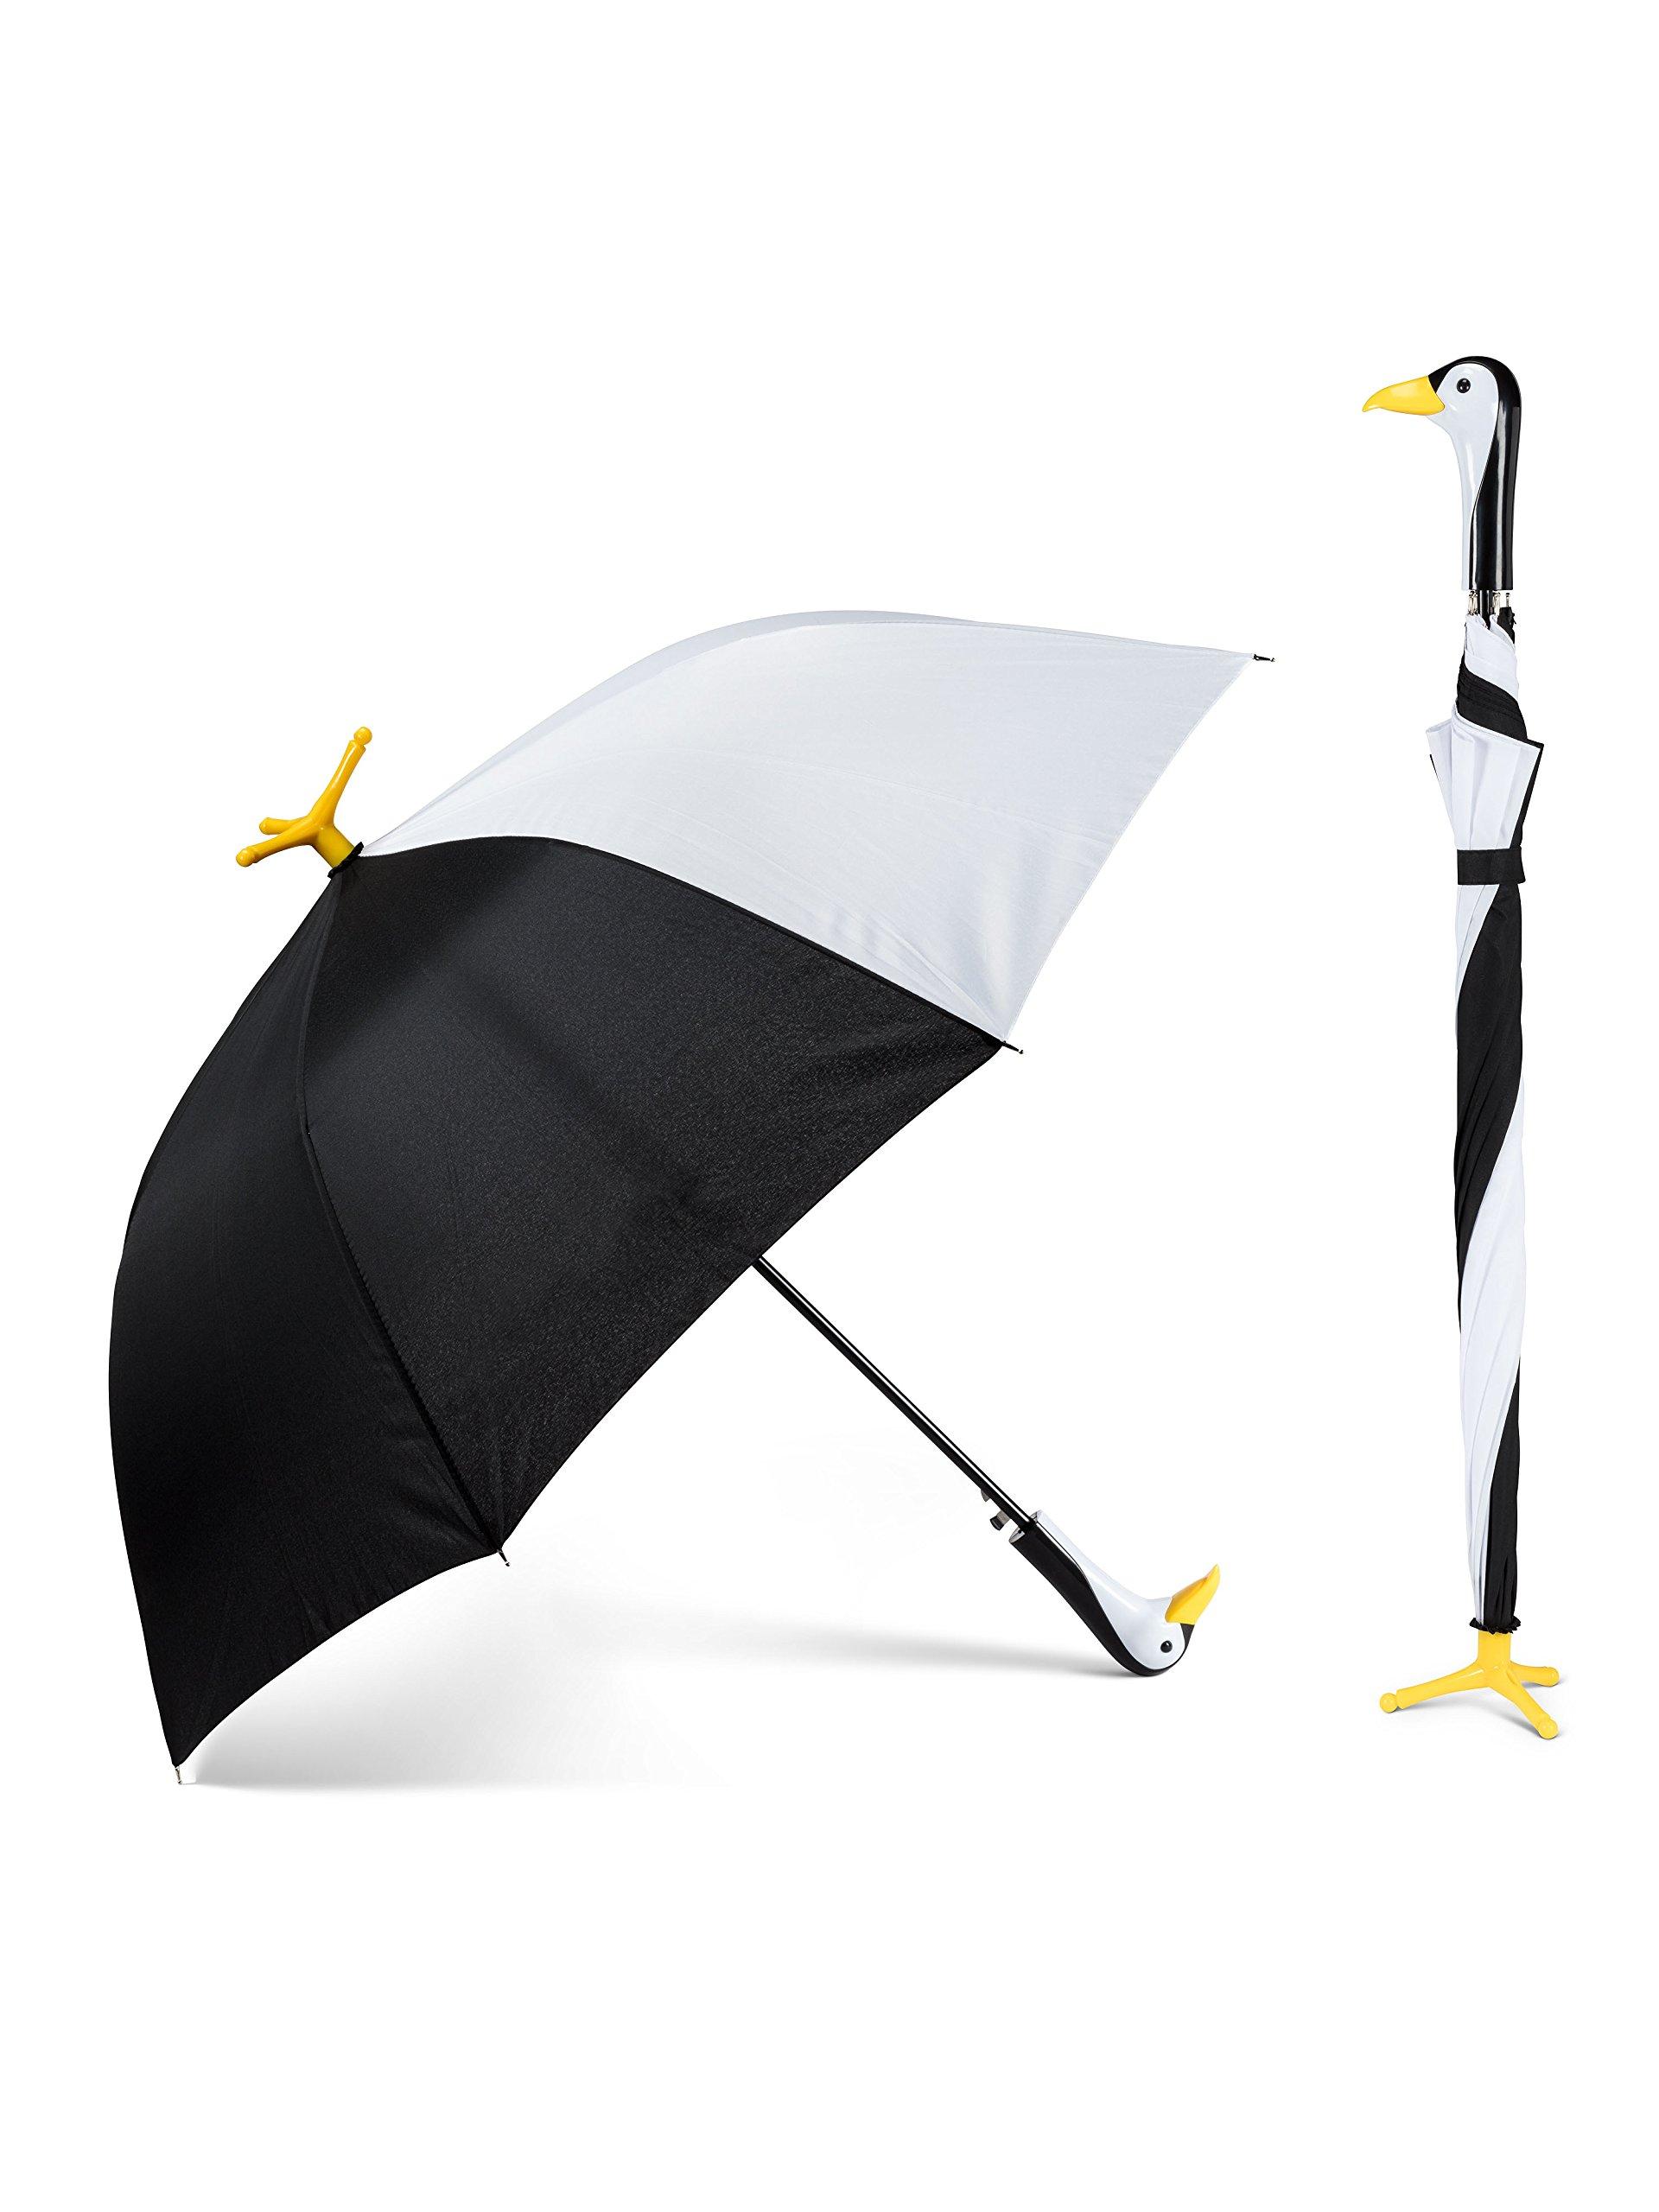 Abbott Collection 27 UMB Penguin Stick Umbrella-40 W, Black and White